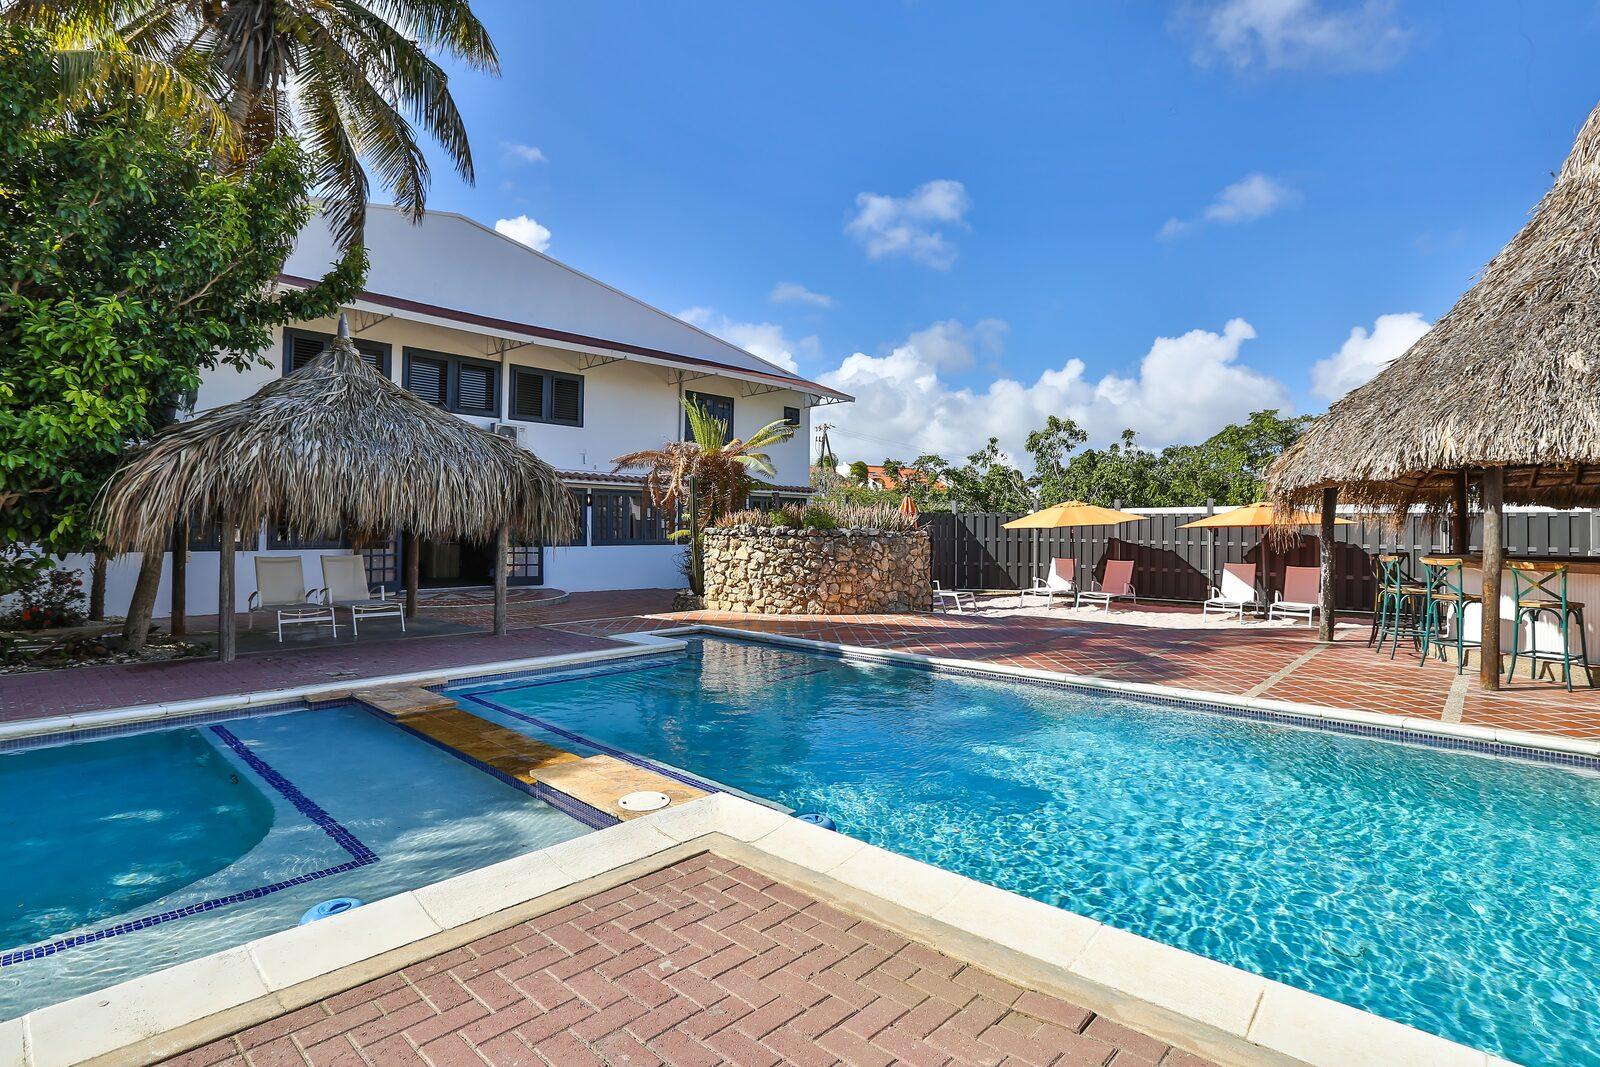 Hotel Bonaire swimming pool